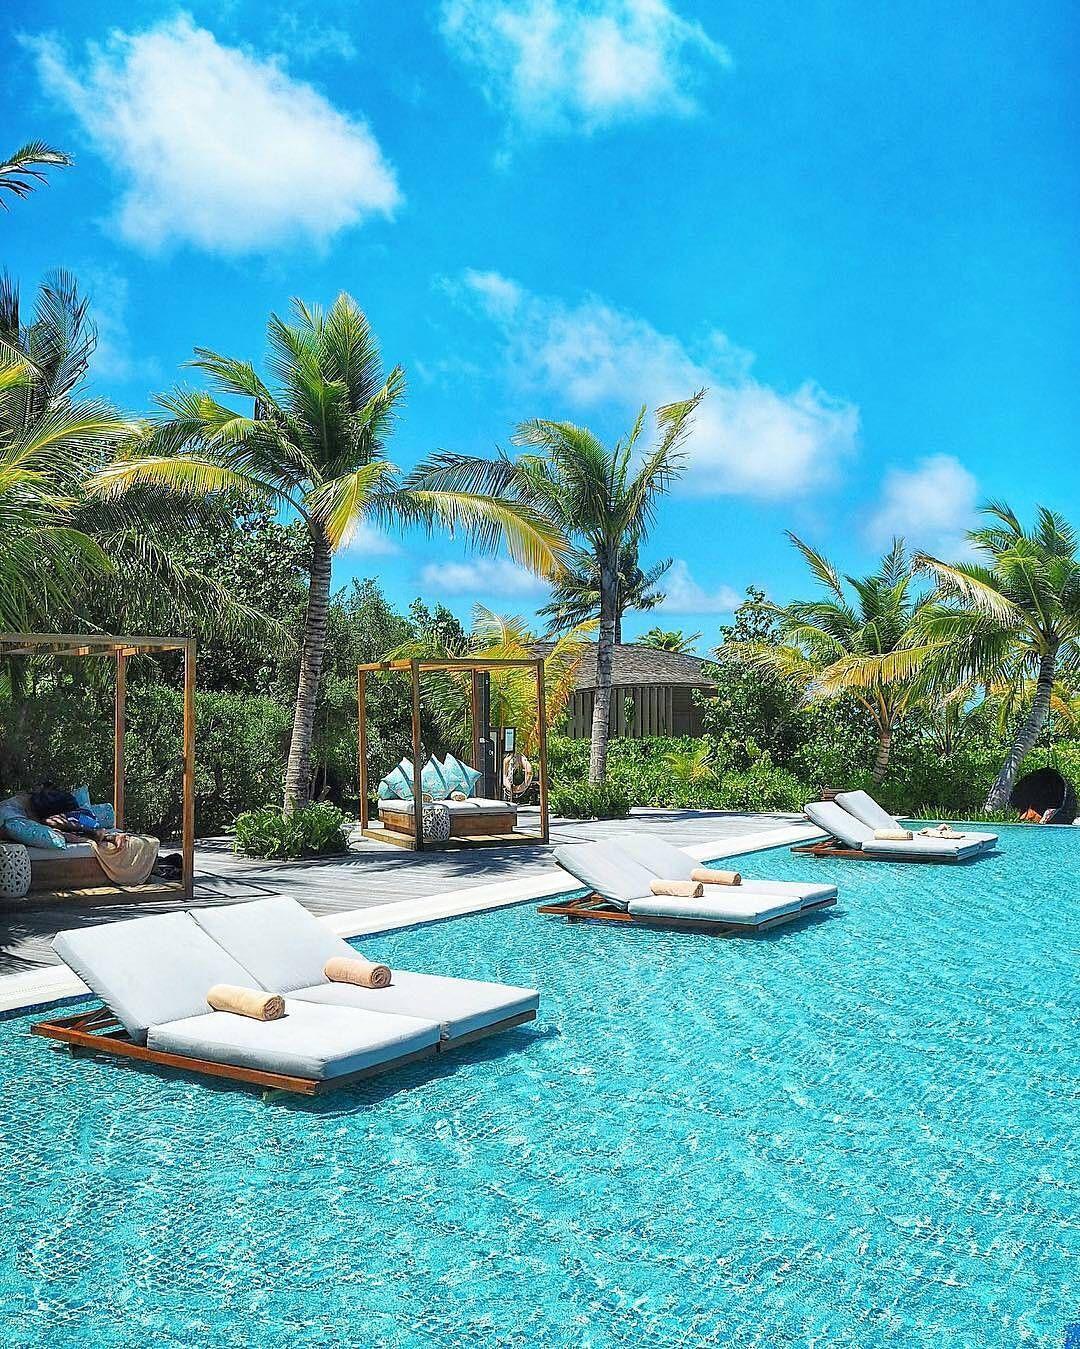 Maldives Beach: The Maldives Islands - Club Med Finolhu Villas